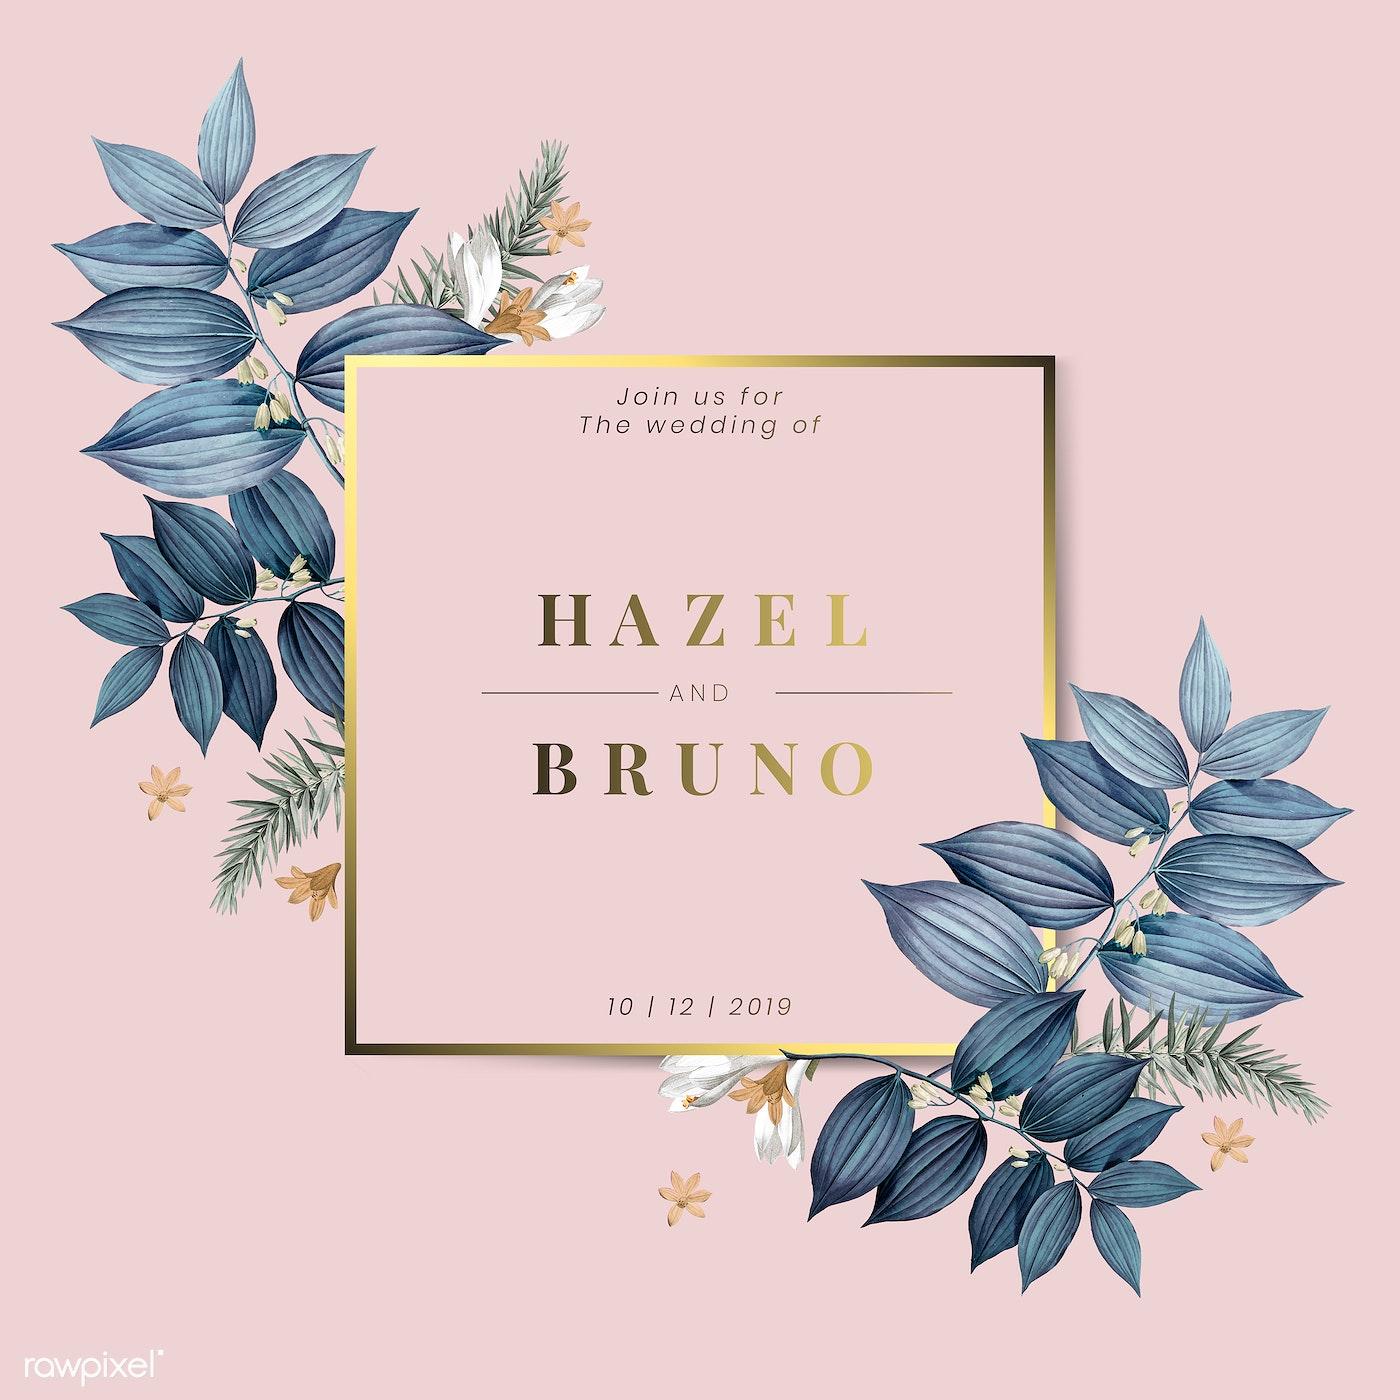 Flowers Vector Design Wedding Invitations Wedding: Floral Wedding Invitation Card Design Vector